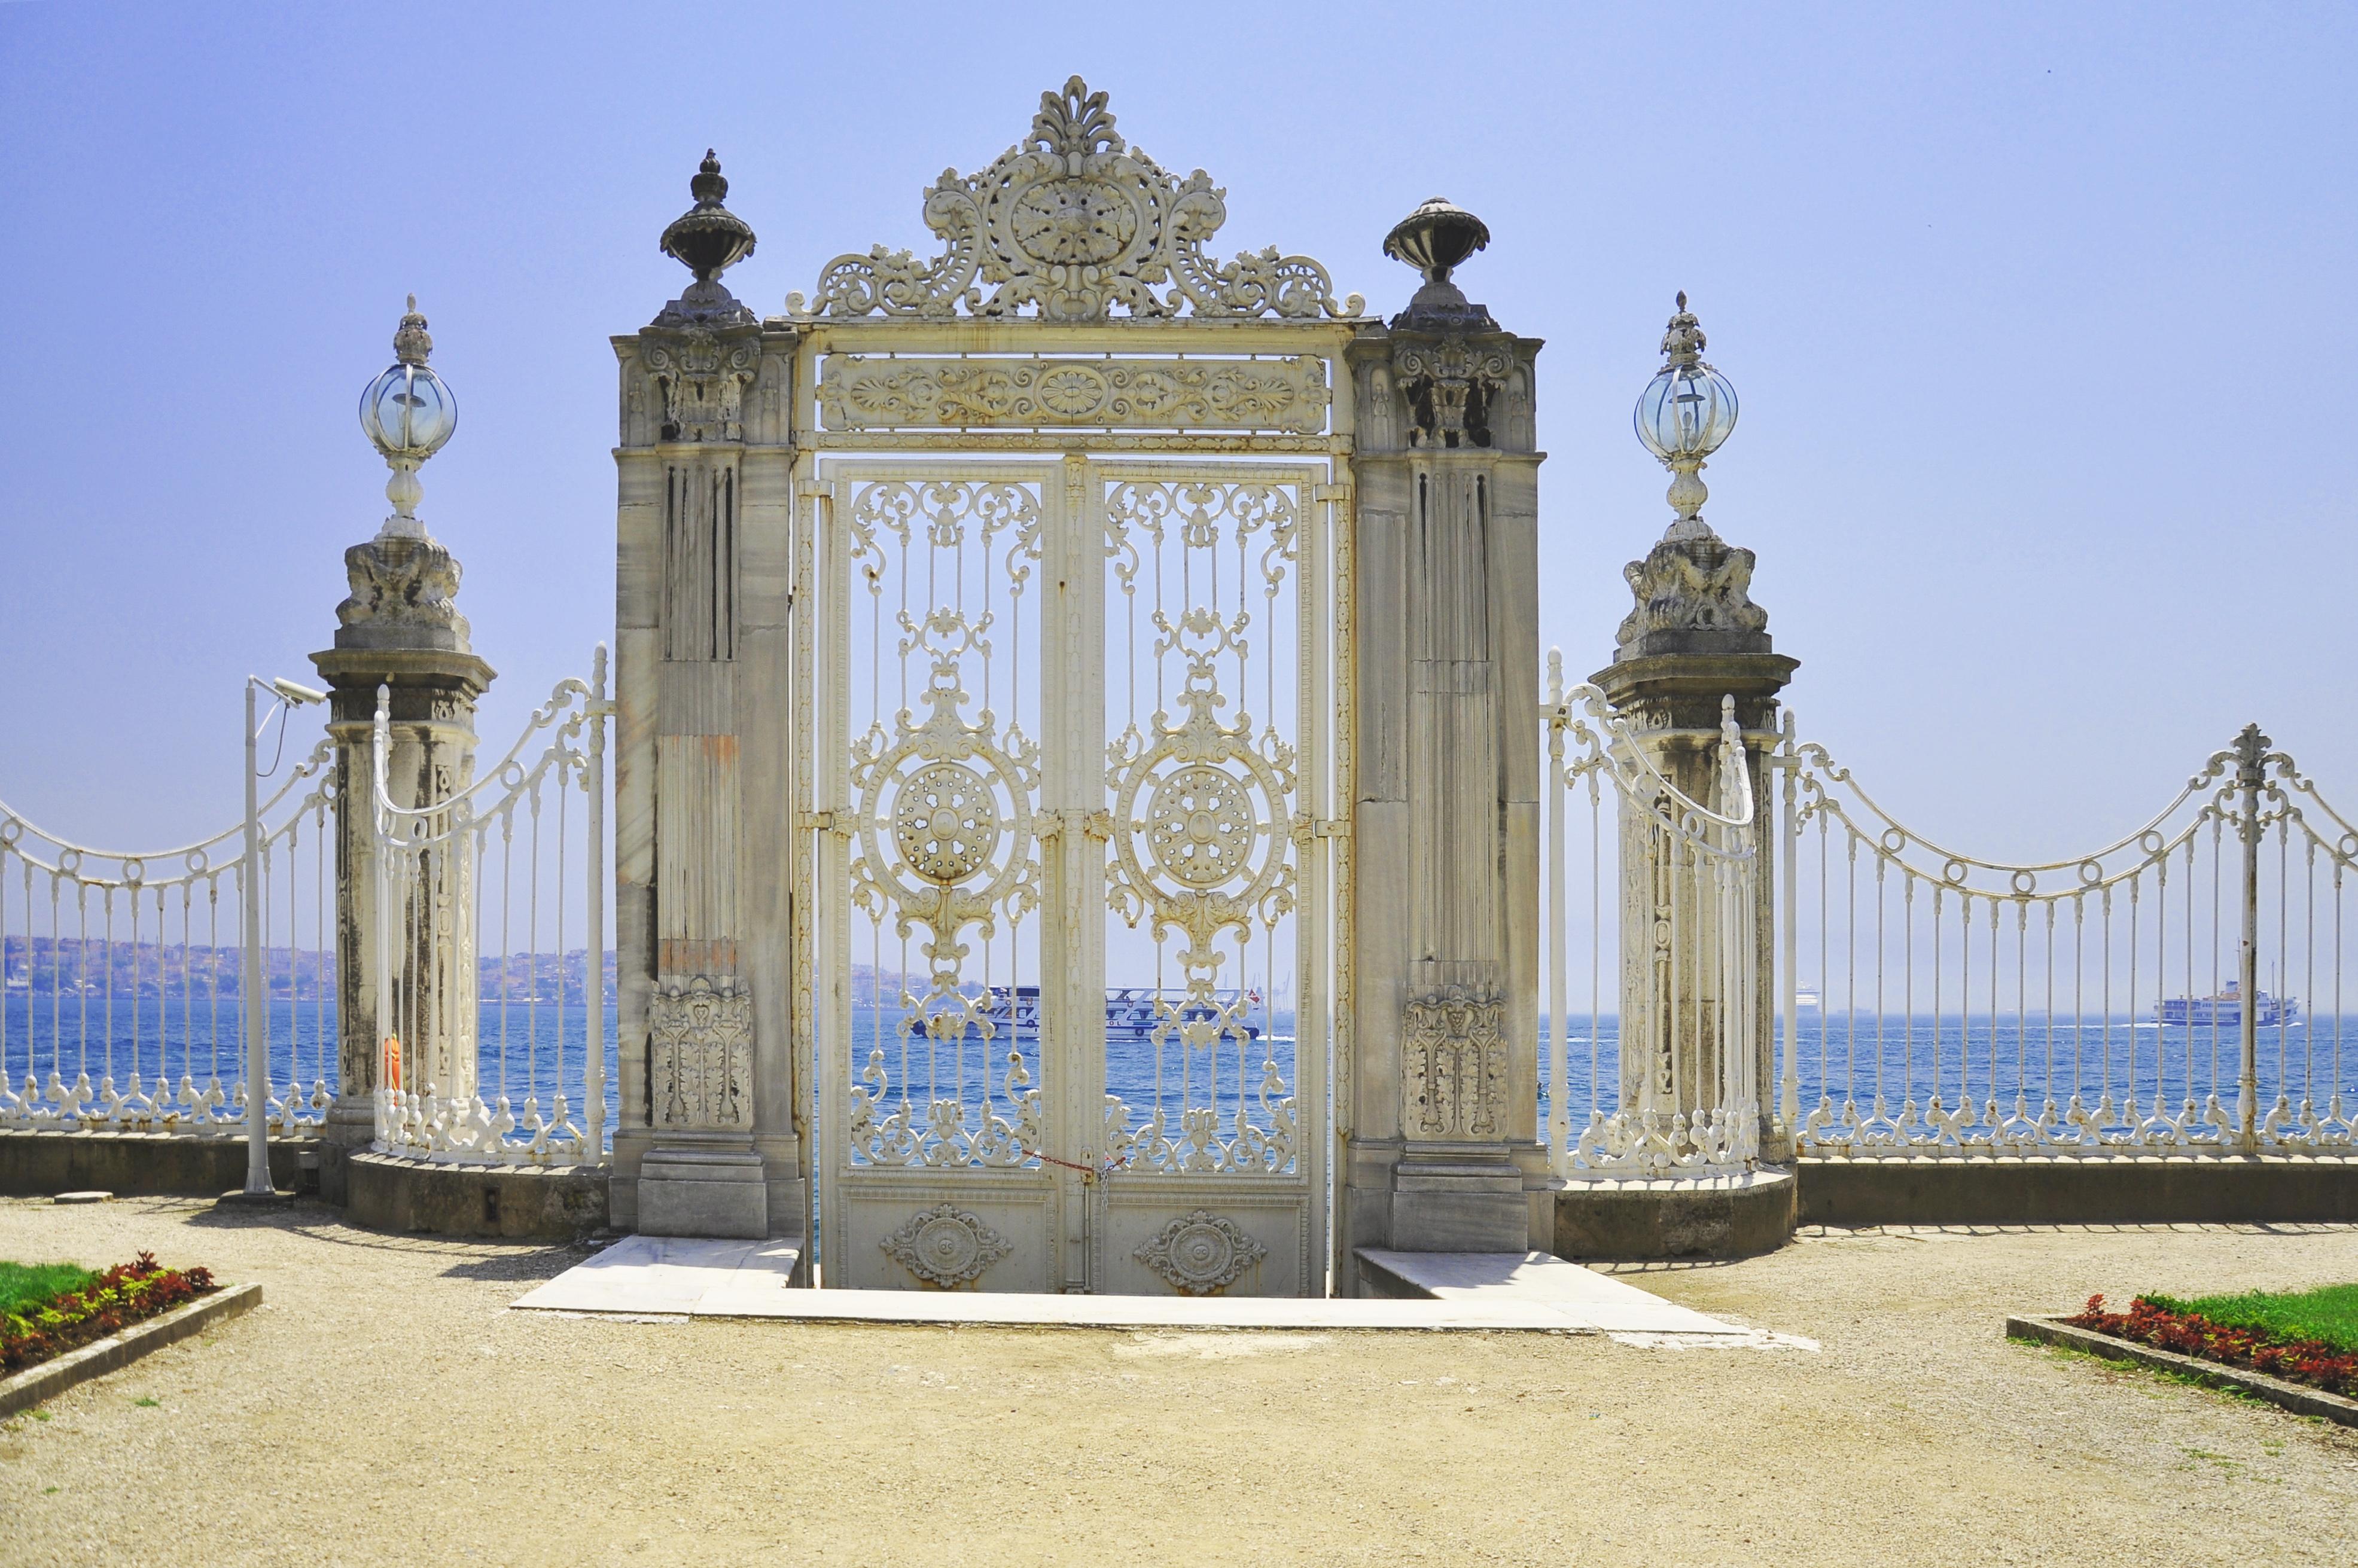 File:Gate of Dolmabahçe Palace, Istanbul, Turkey 001.jpg ...